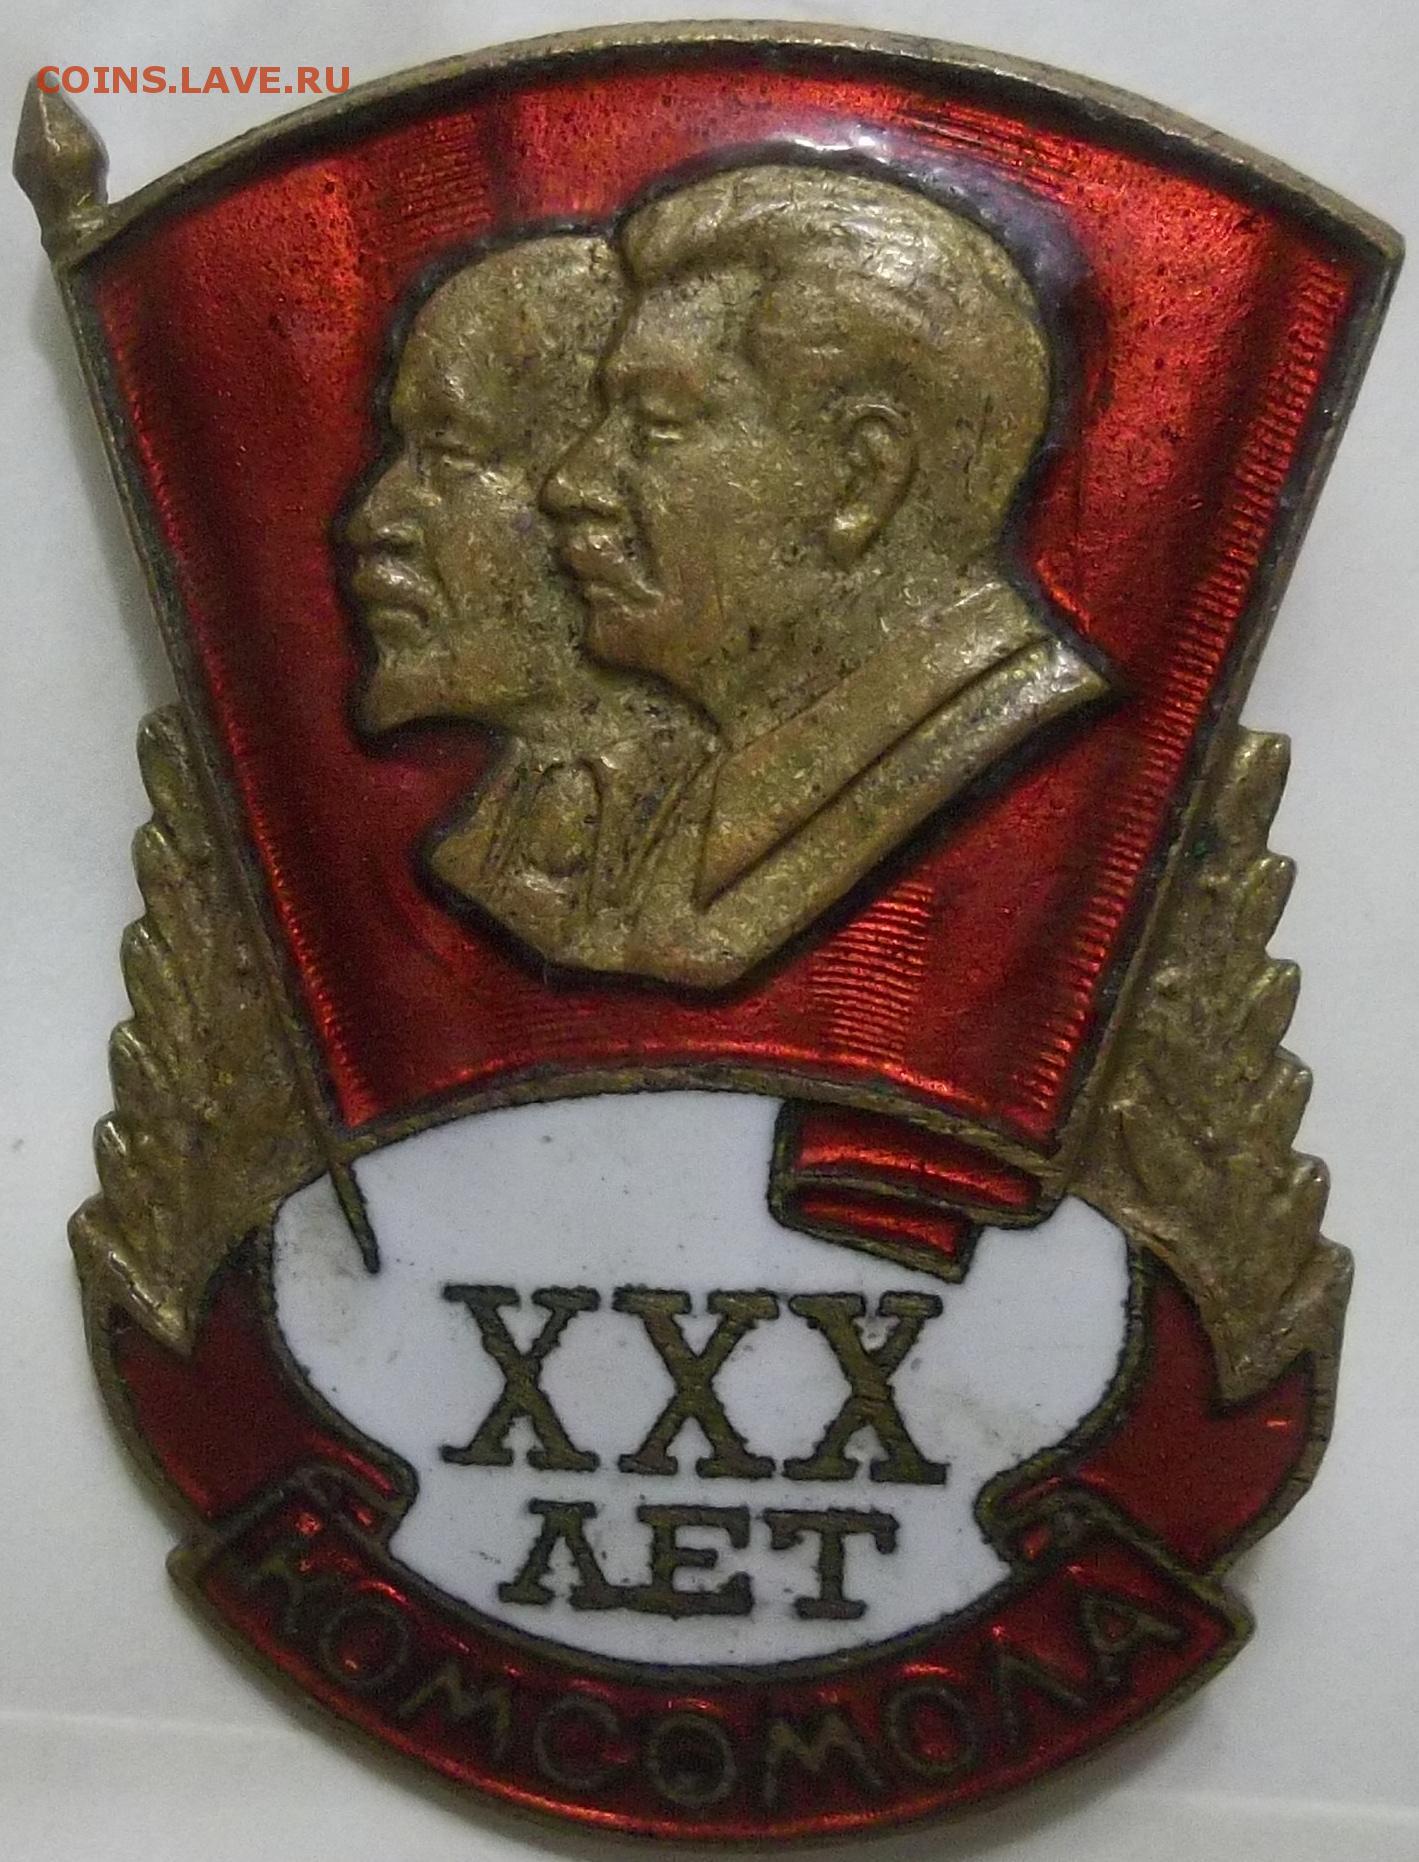 Значок 30 лет комсомола цена продажи золотую монету амурский 96 год тигр 10000 руб